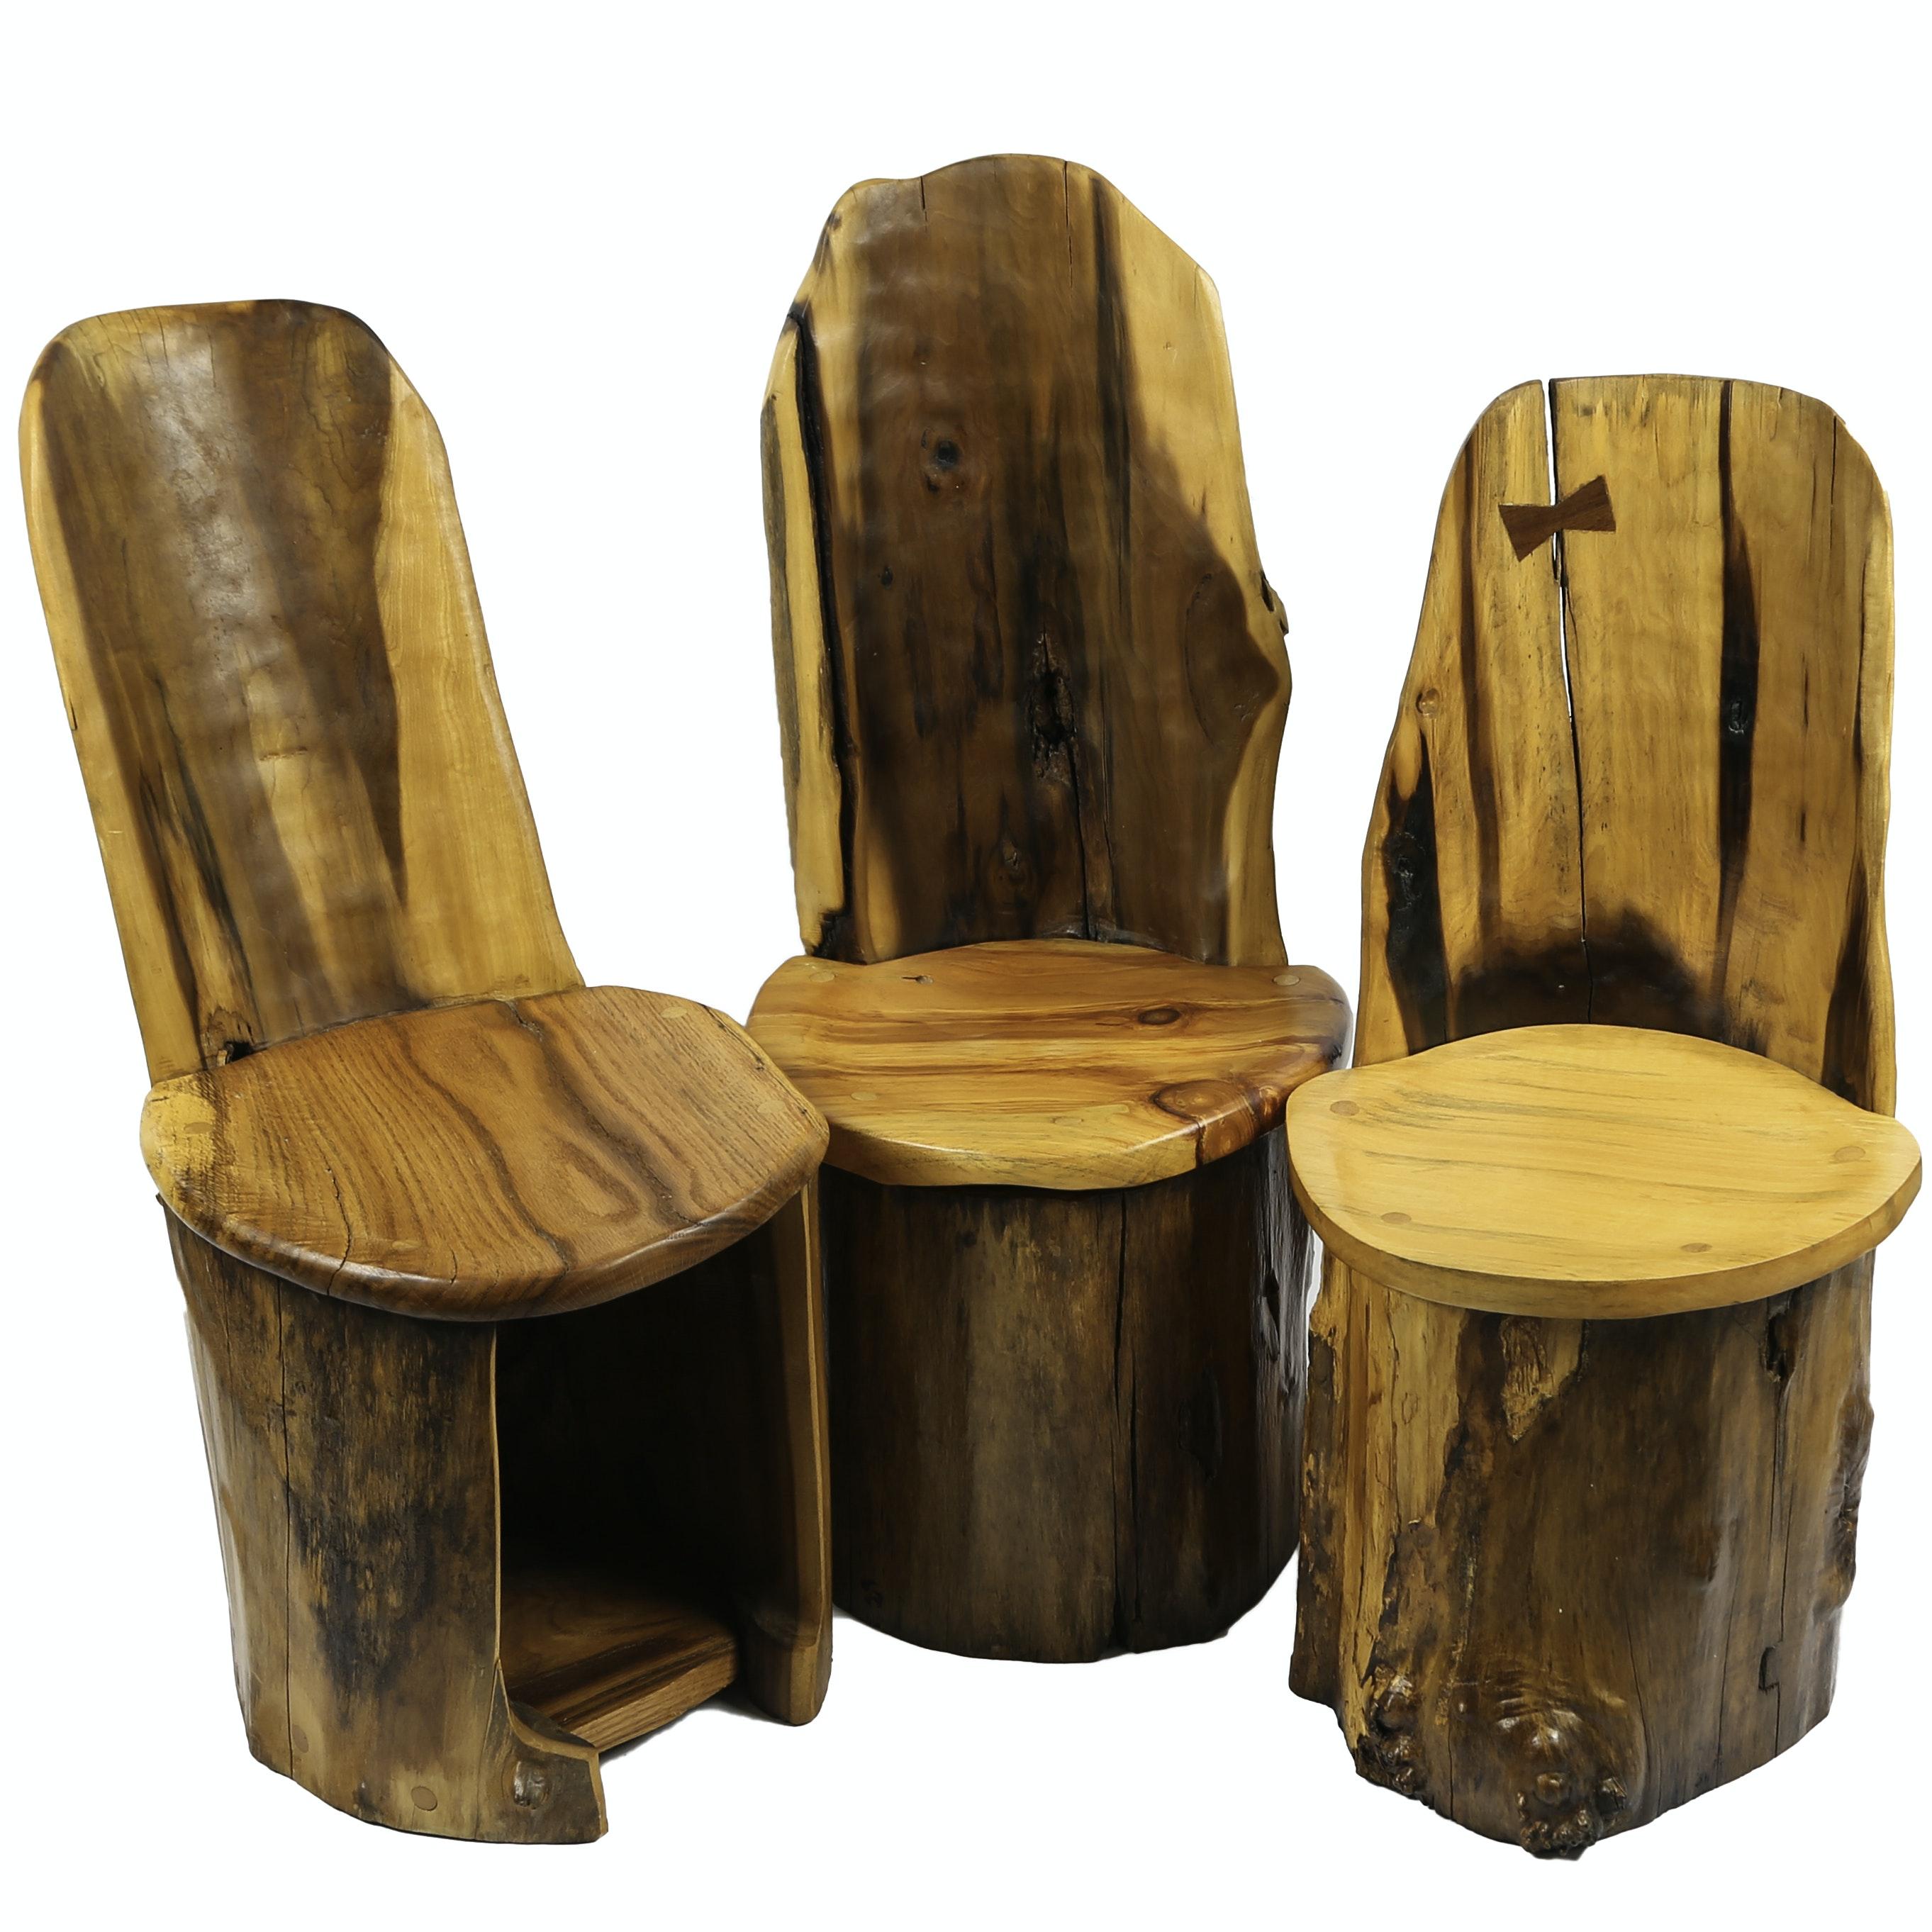 Beau Tom Sternal Handcrafted Folk Art Childrenu0027s Log Chairs ...